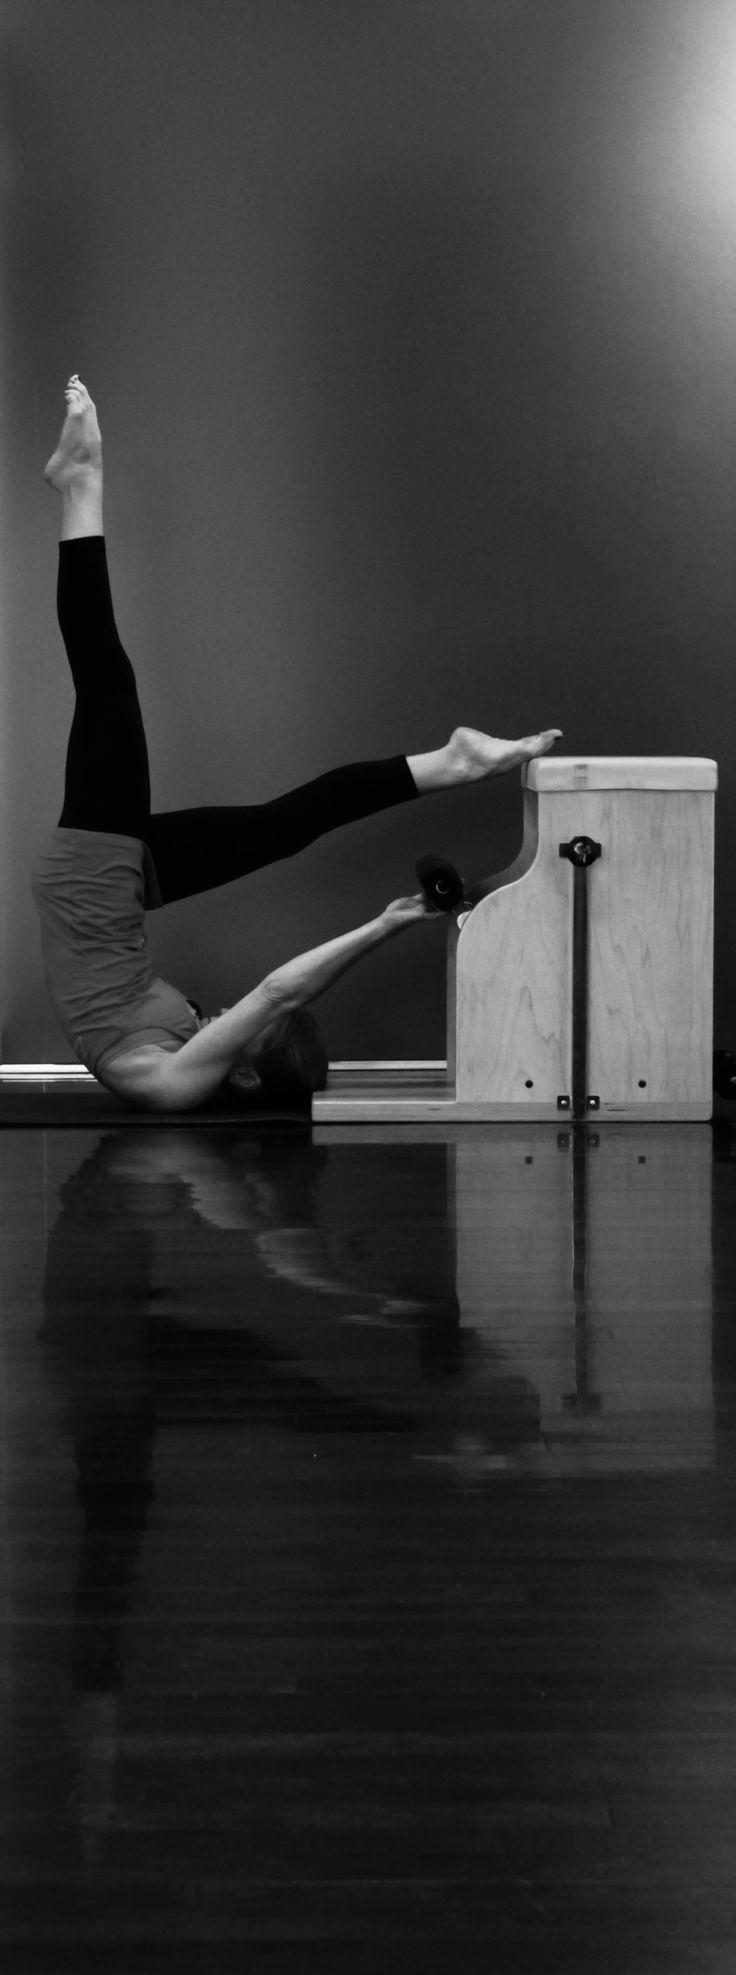 11 best Pilates Chair images on Pinterest | Back walkover ...